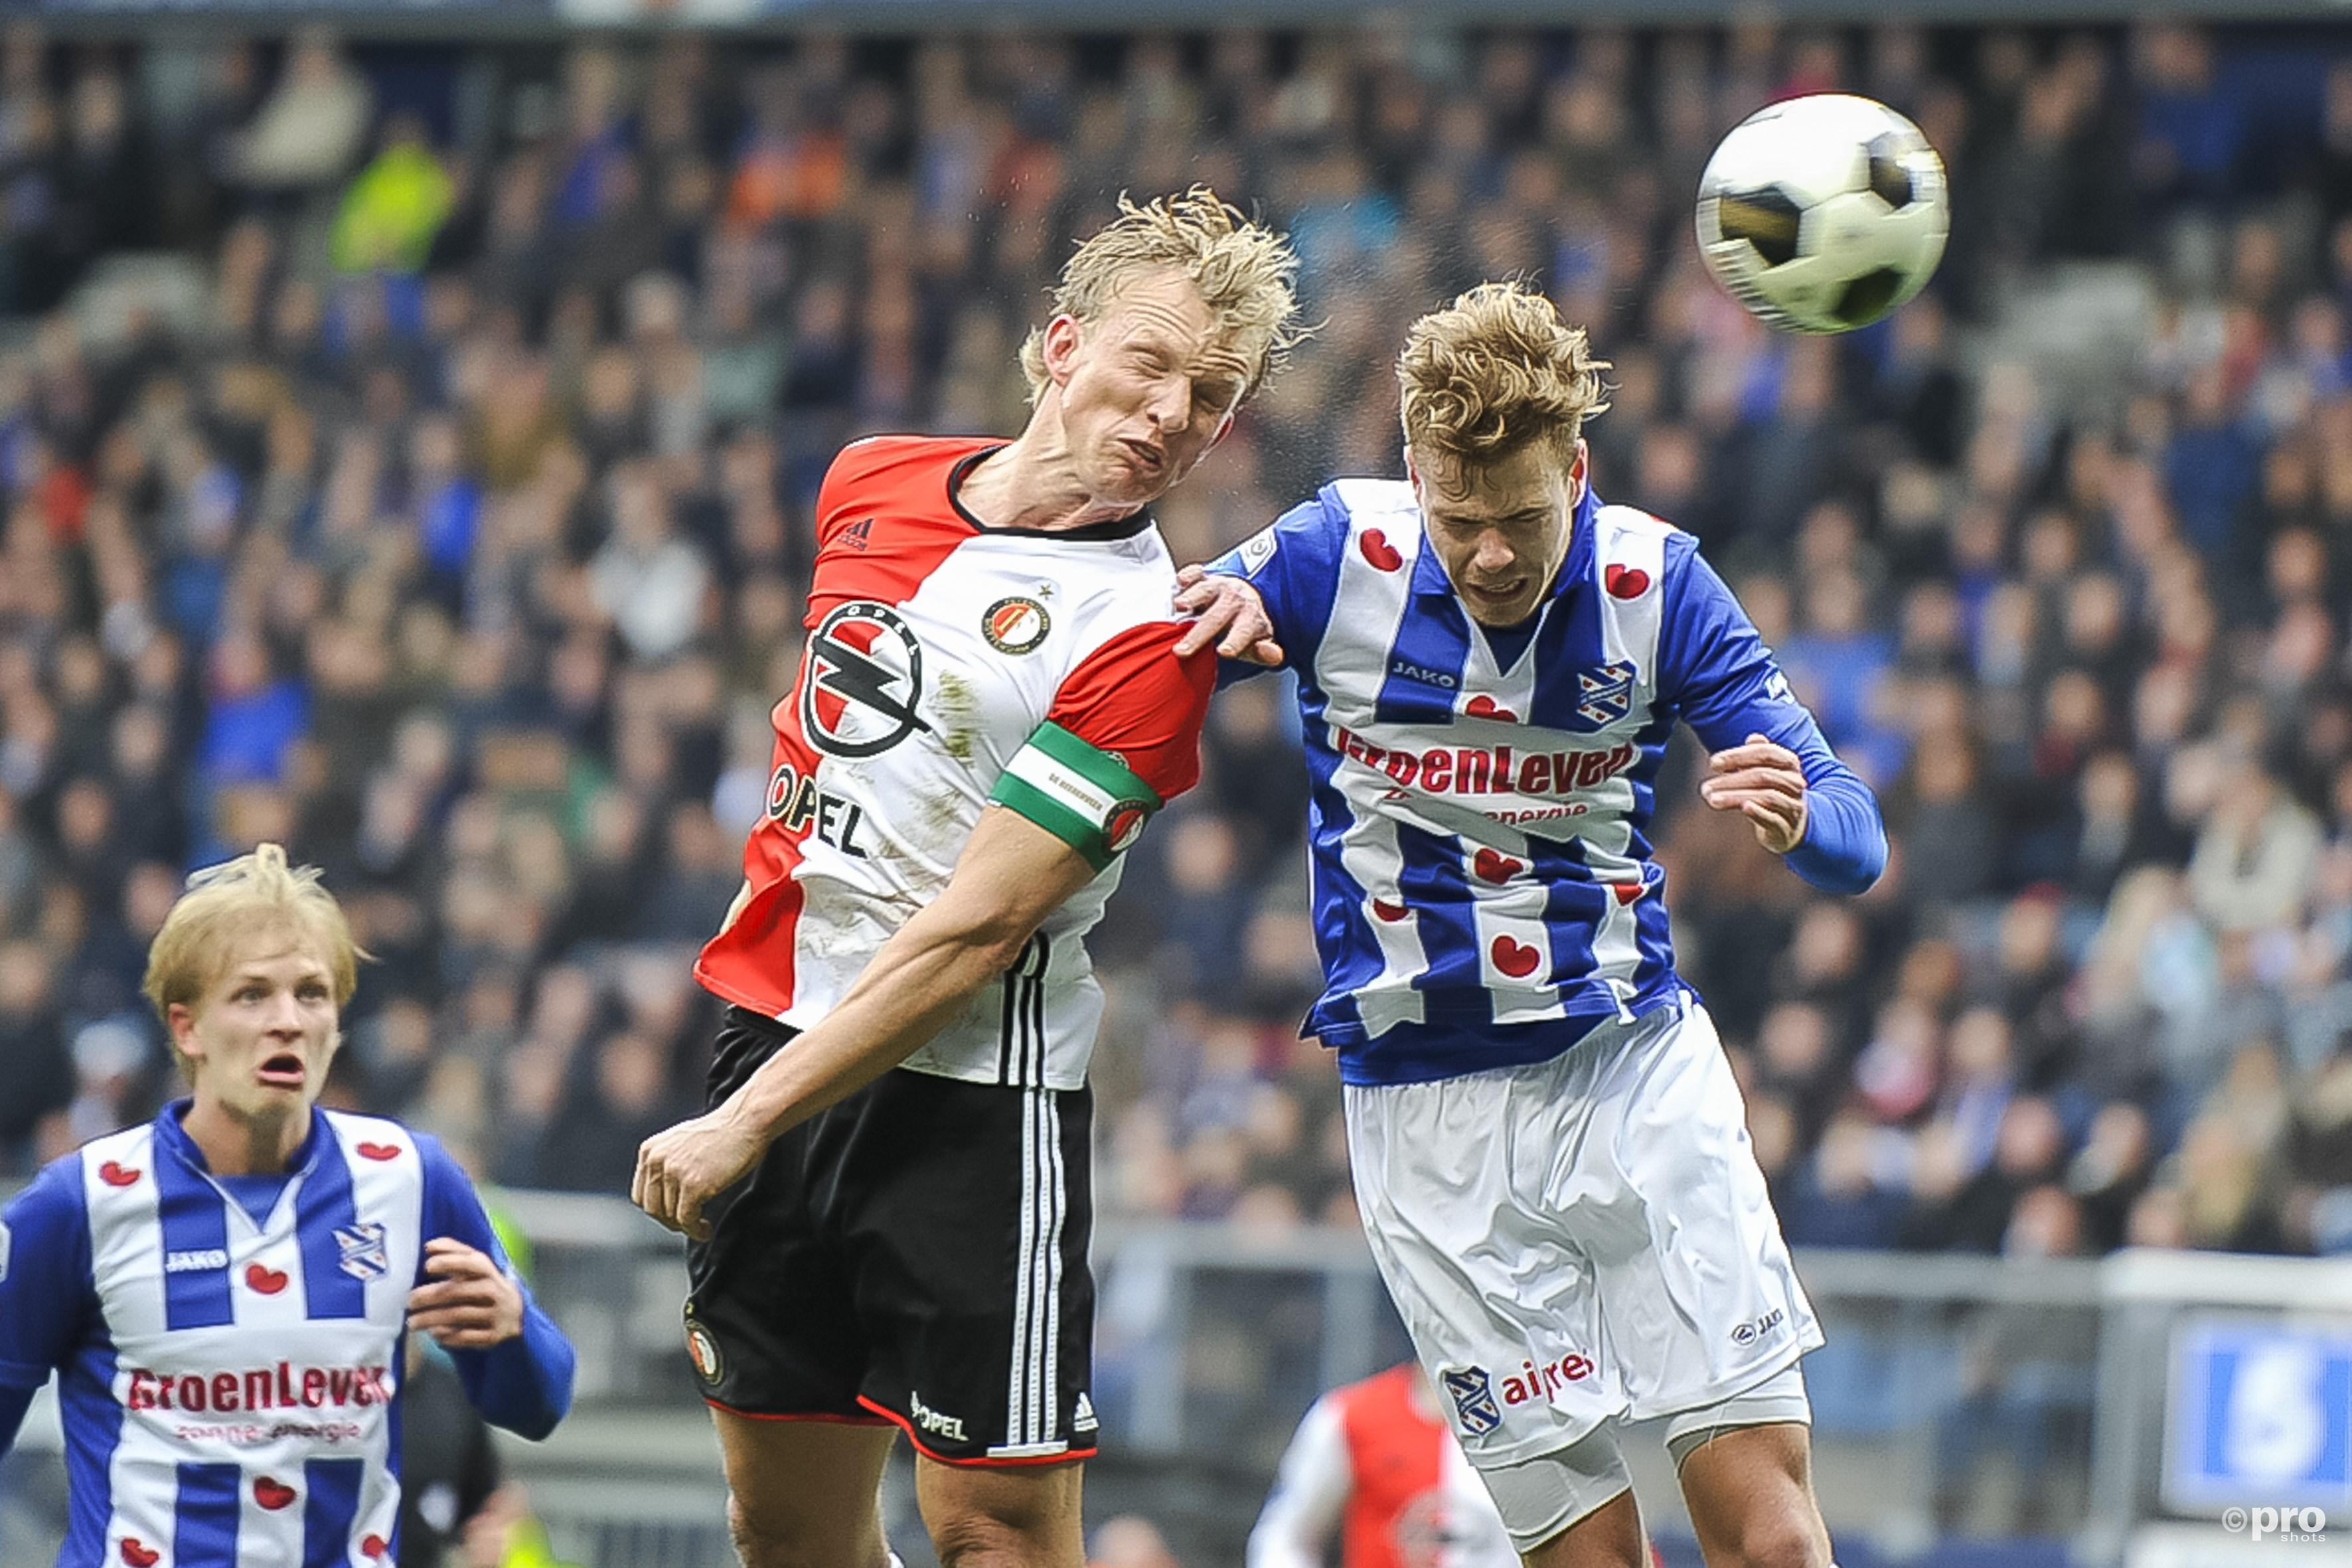 Dirk Kuyt (l) in duel met Joost den Aken (r). (PRO SHOTS/Cor Lasker)